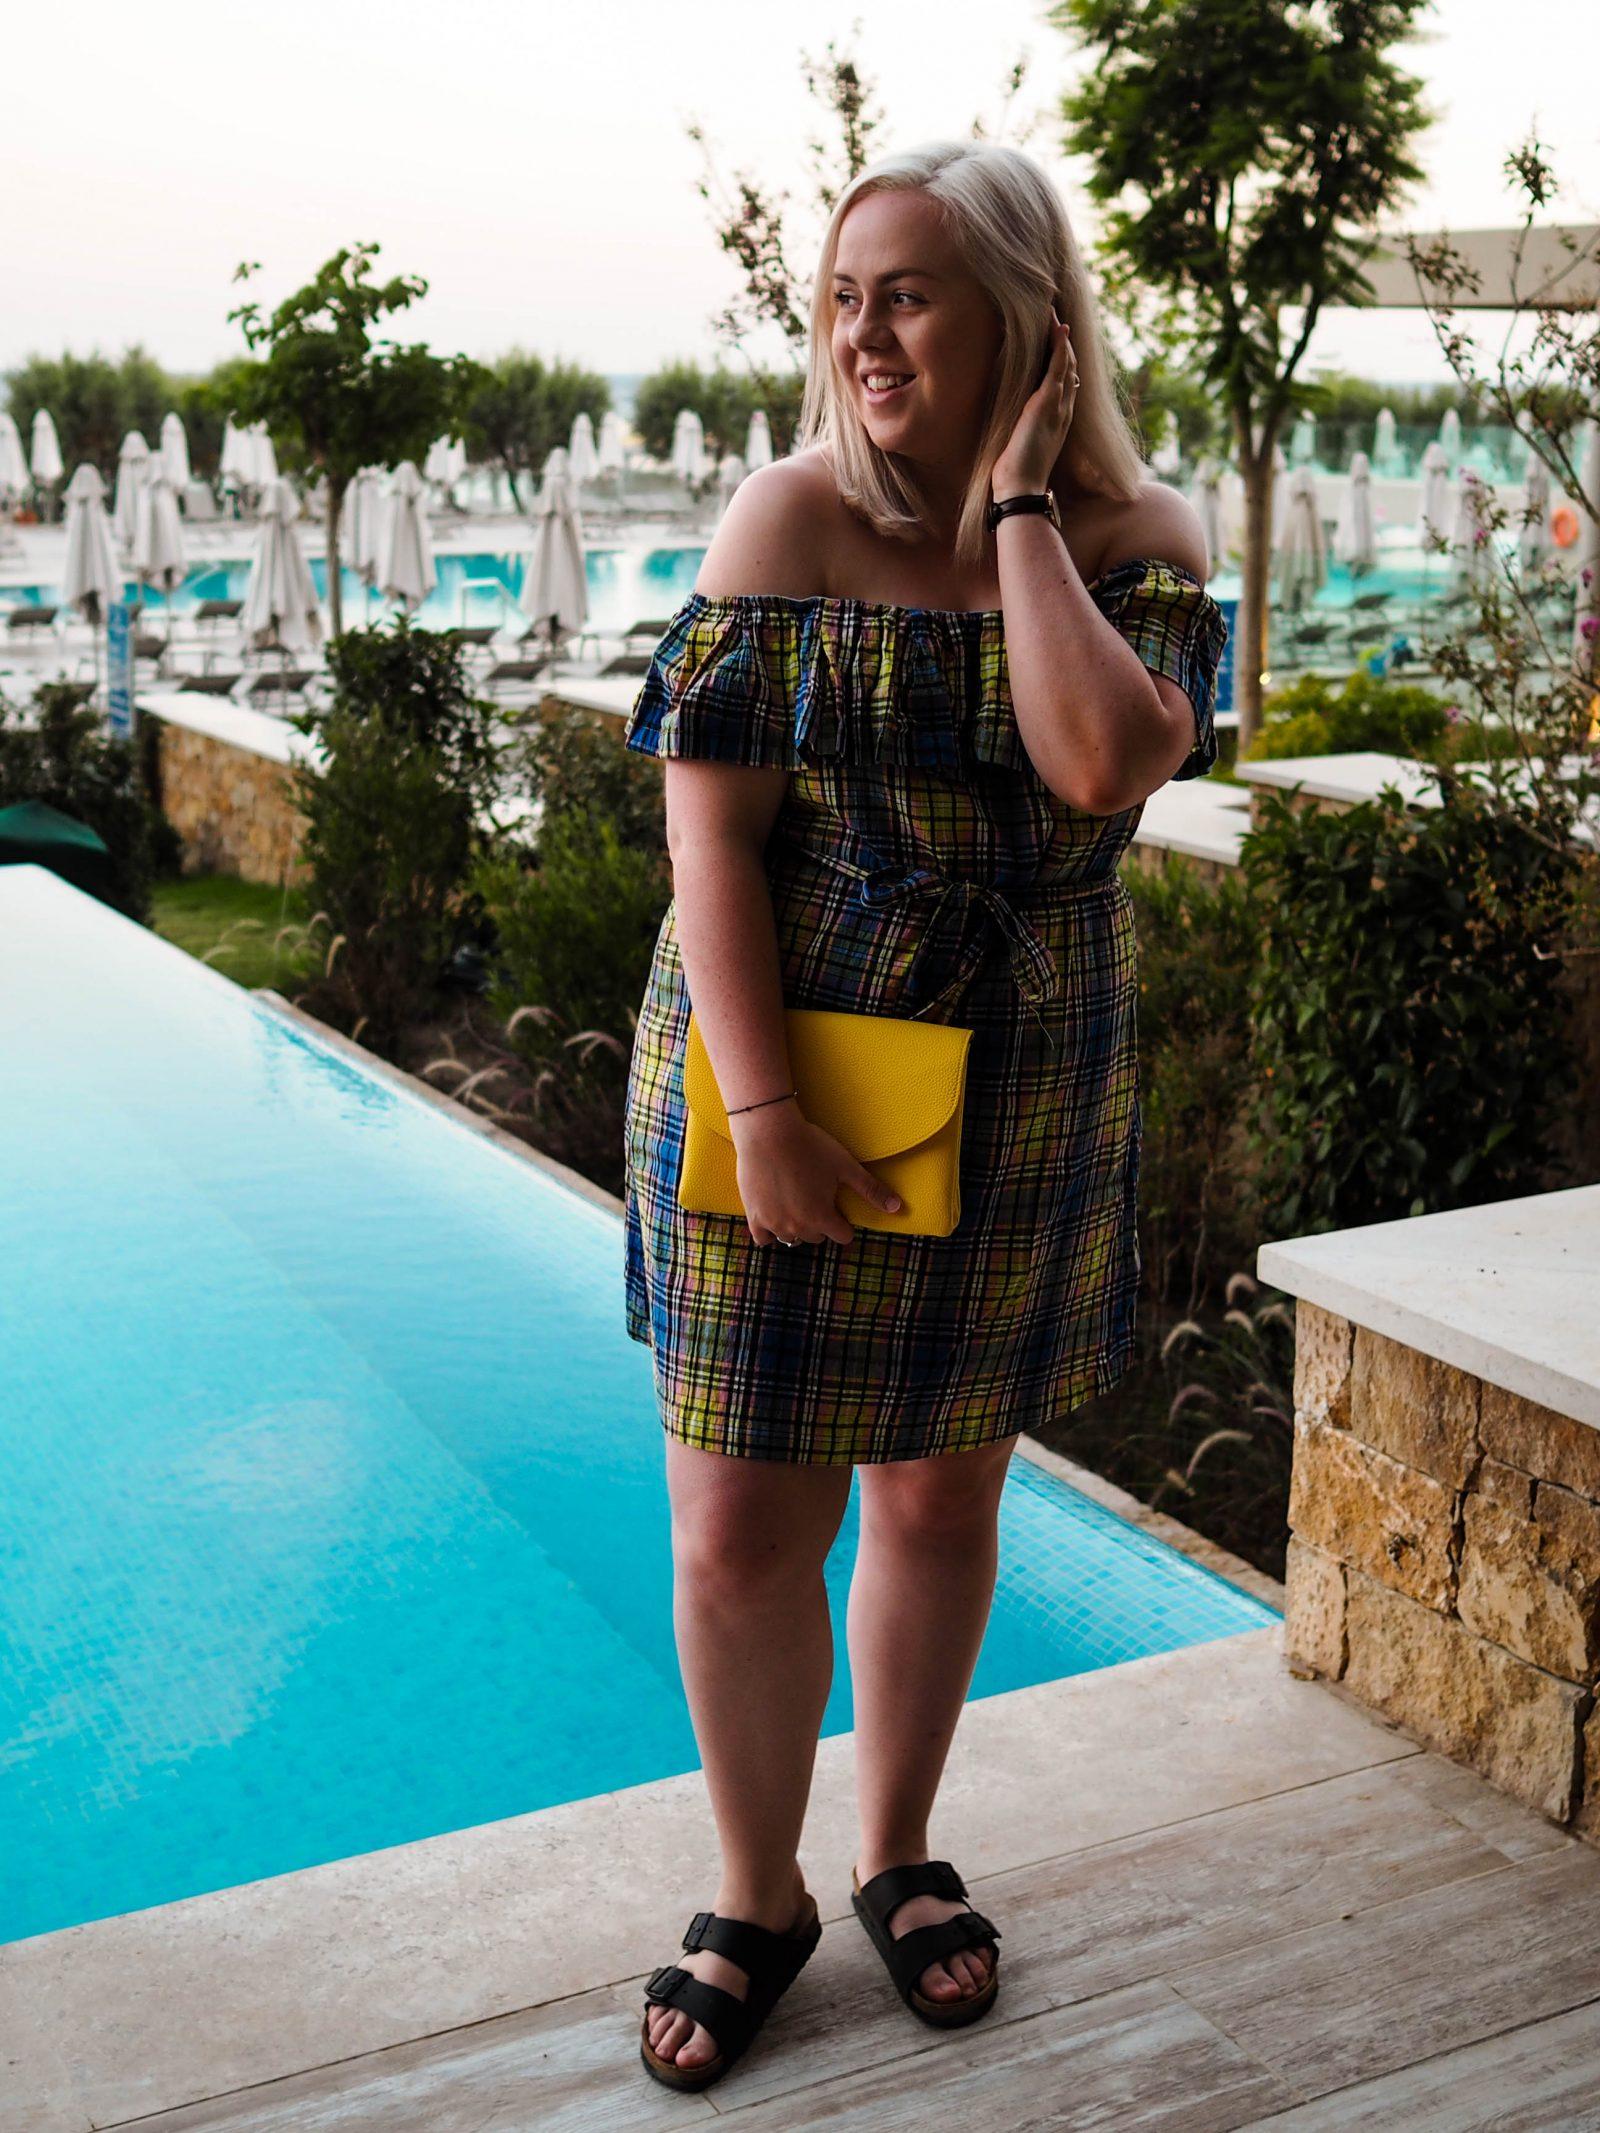 Rhodes in photos | rhianna olivia